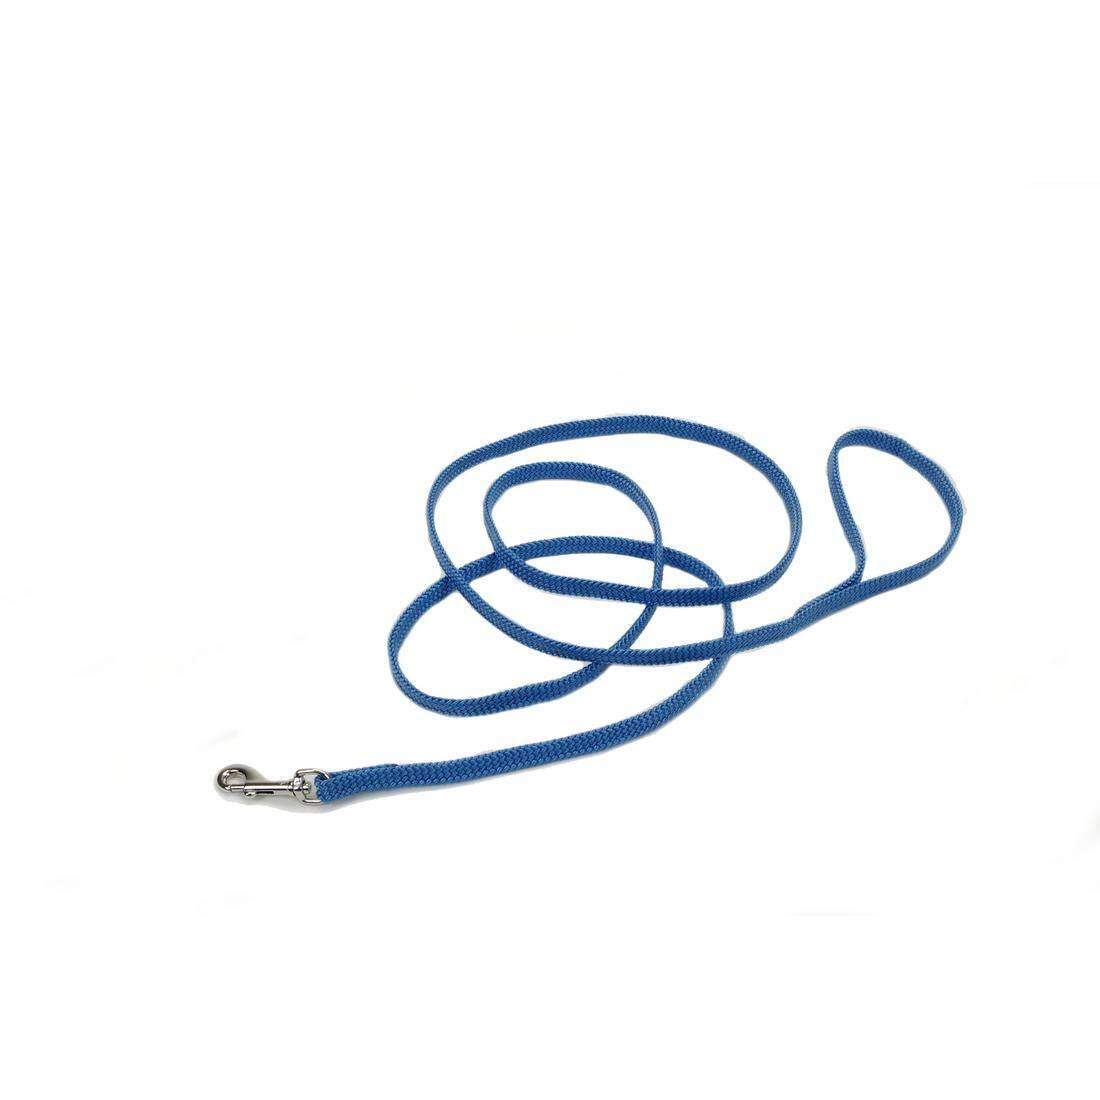 [Coastal] Braided Sunburst Nylon Leash - 6 FEET - Blue Laggon